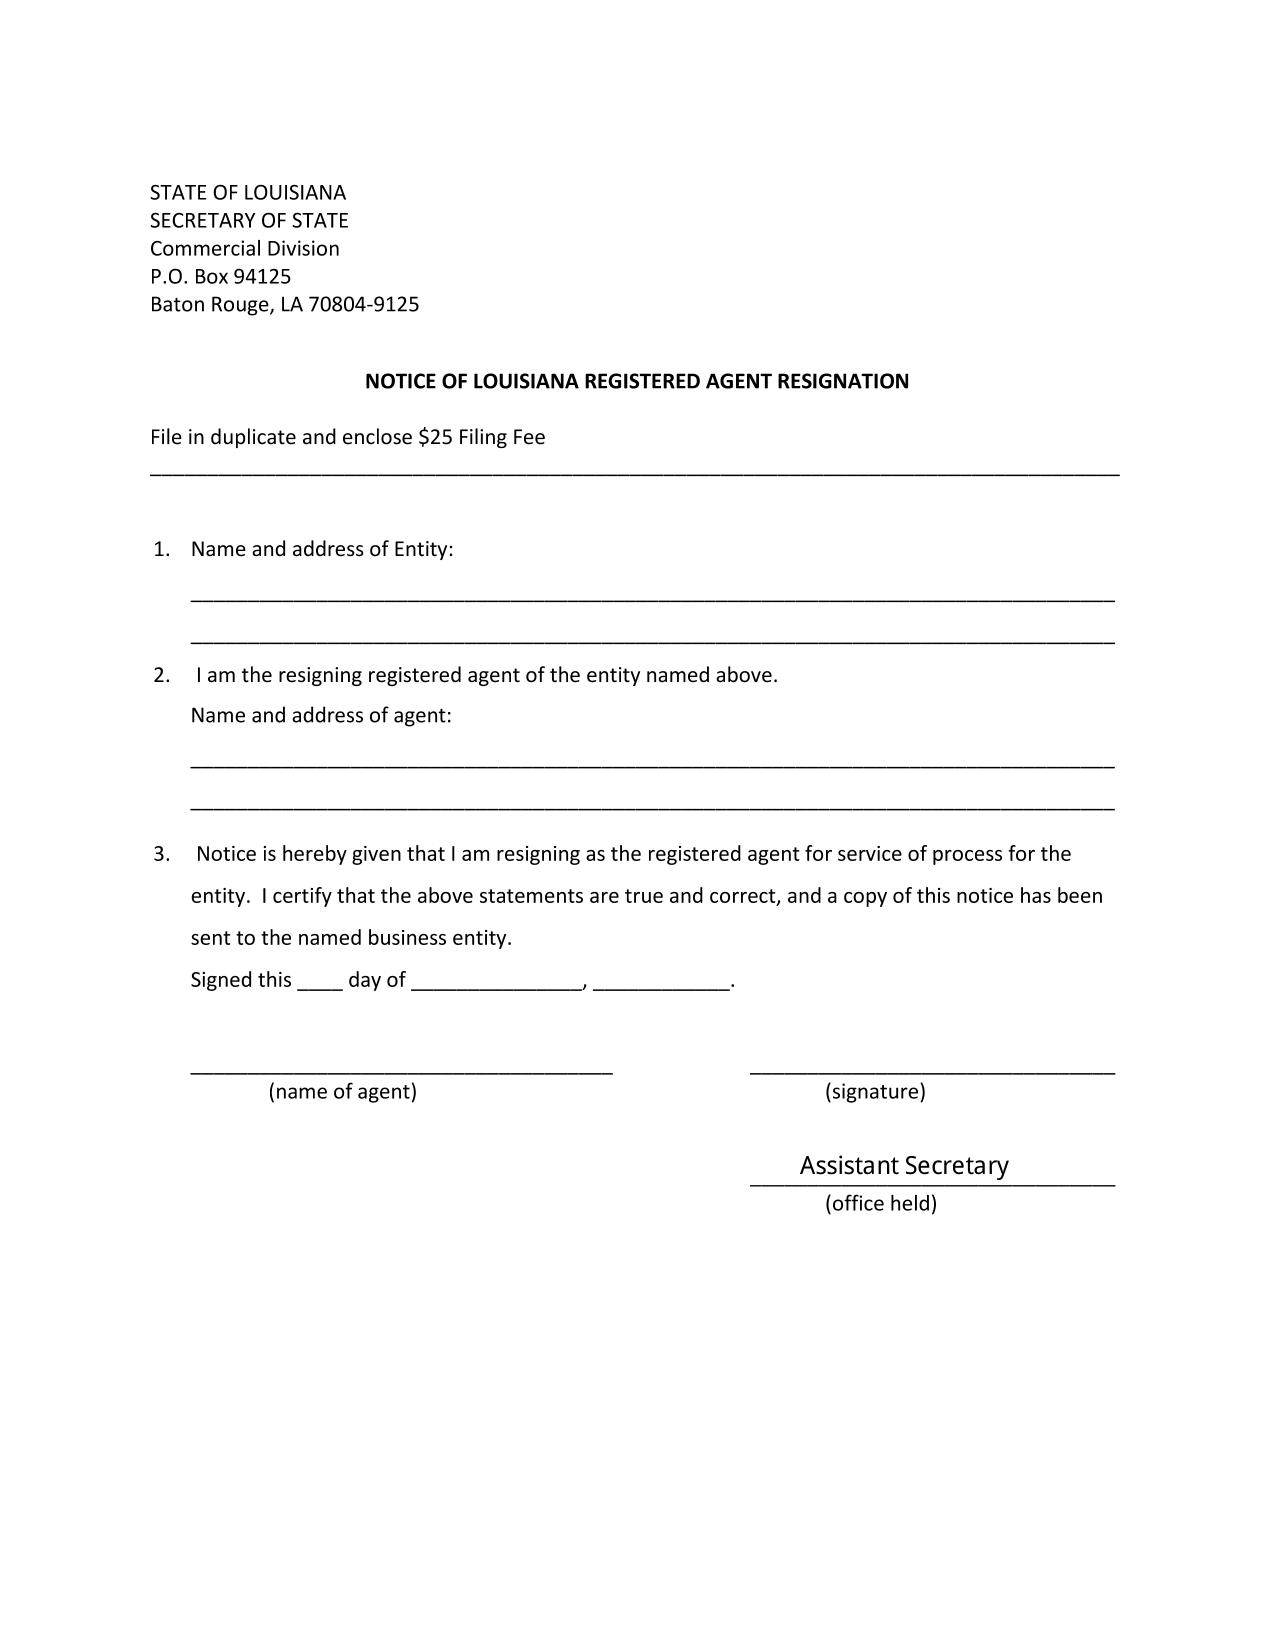 notice-of-louisiana-registered-agent-resignation